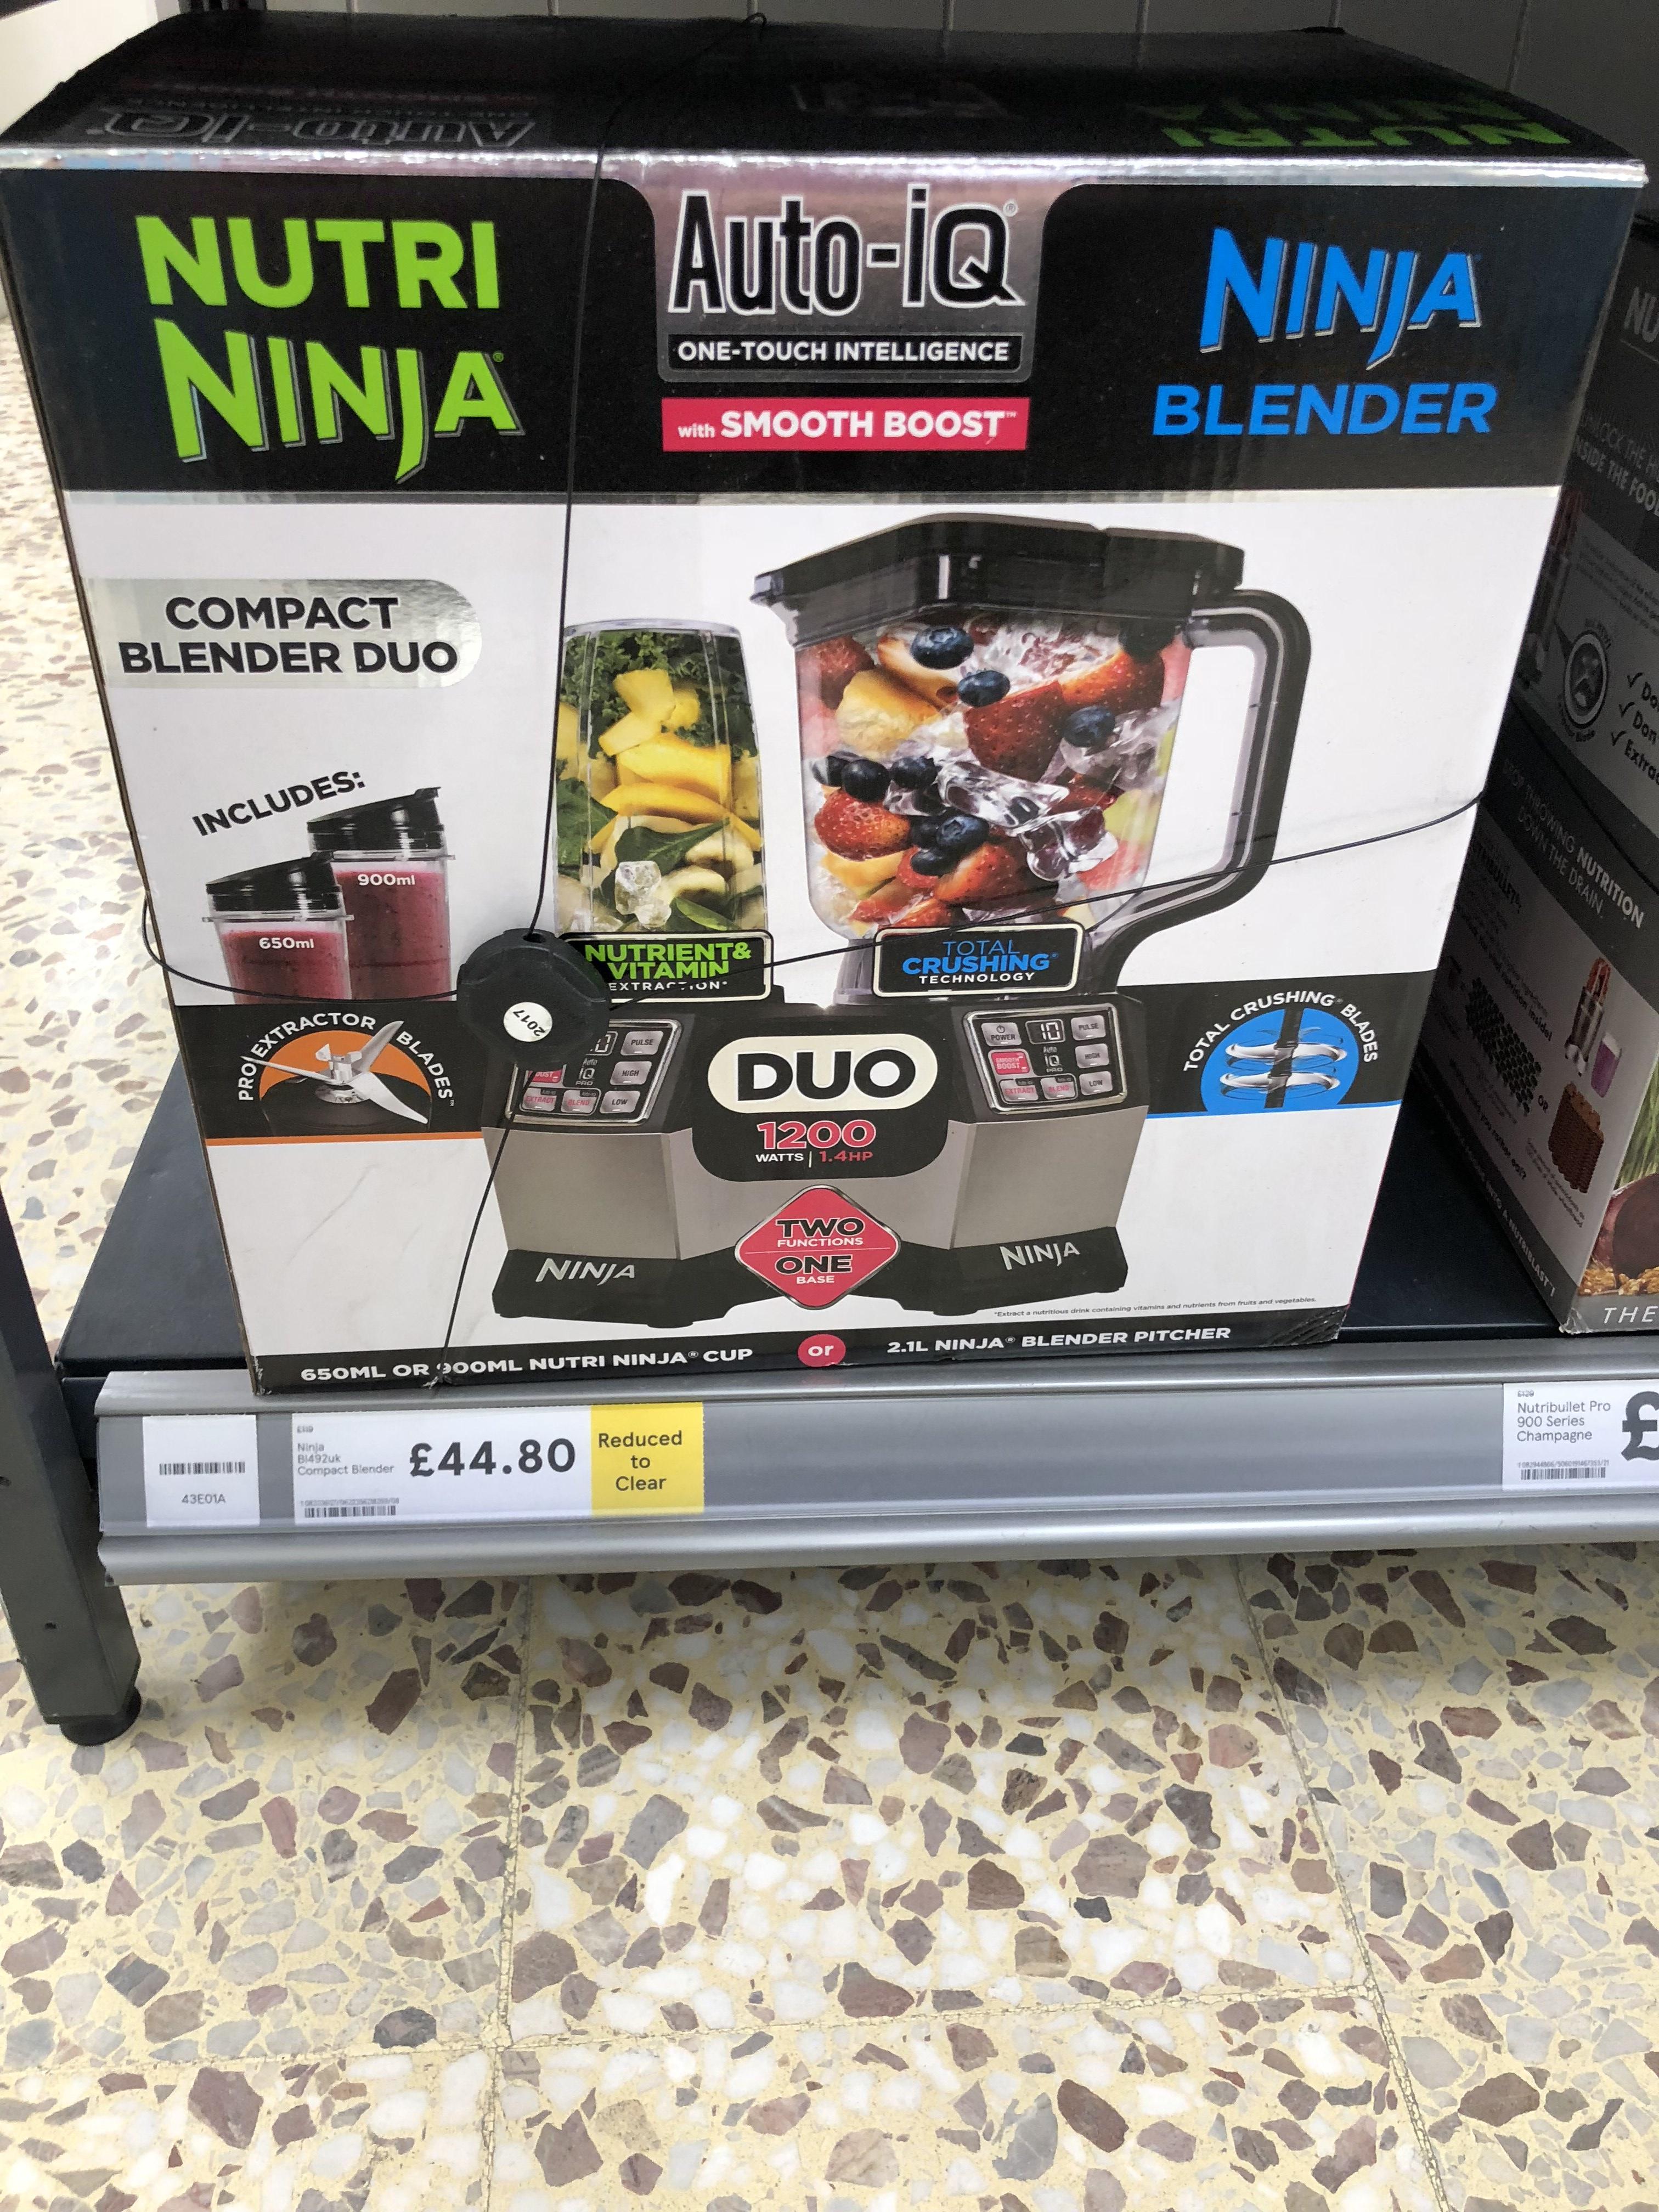 Nutri Ninja - Silver compact blender duo BL492 £44.80 @ Tesco York